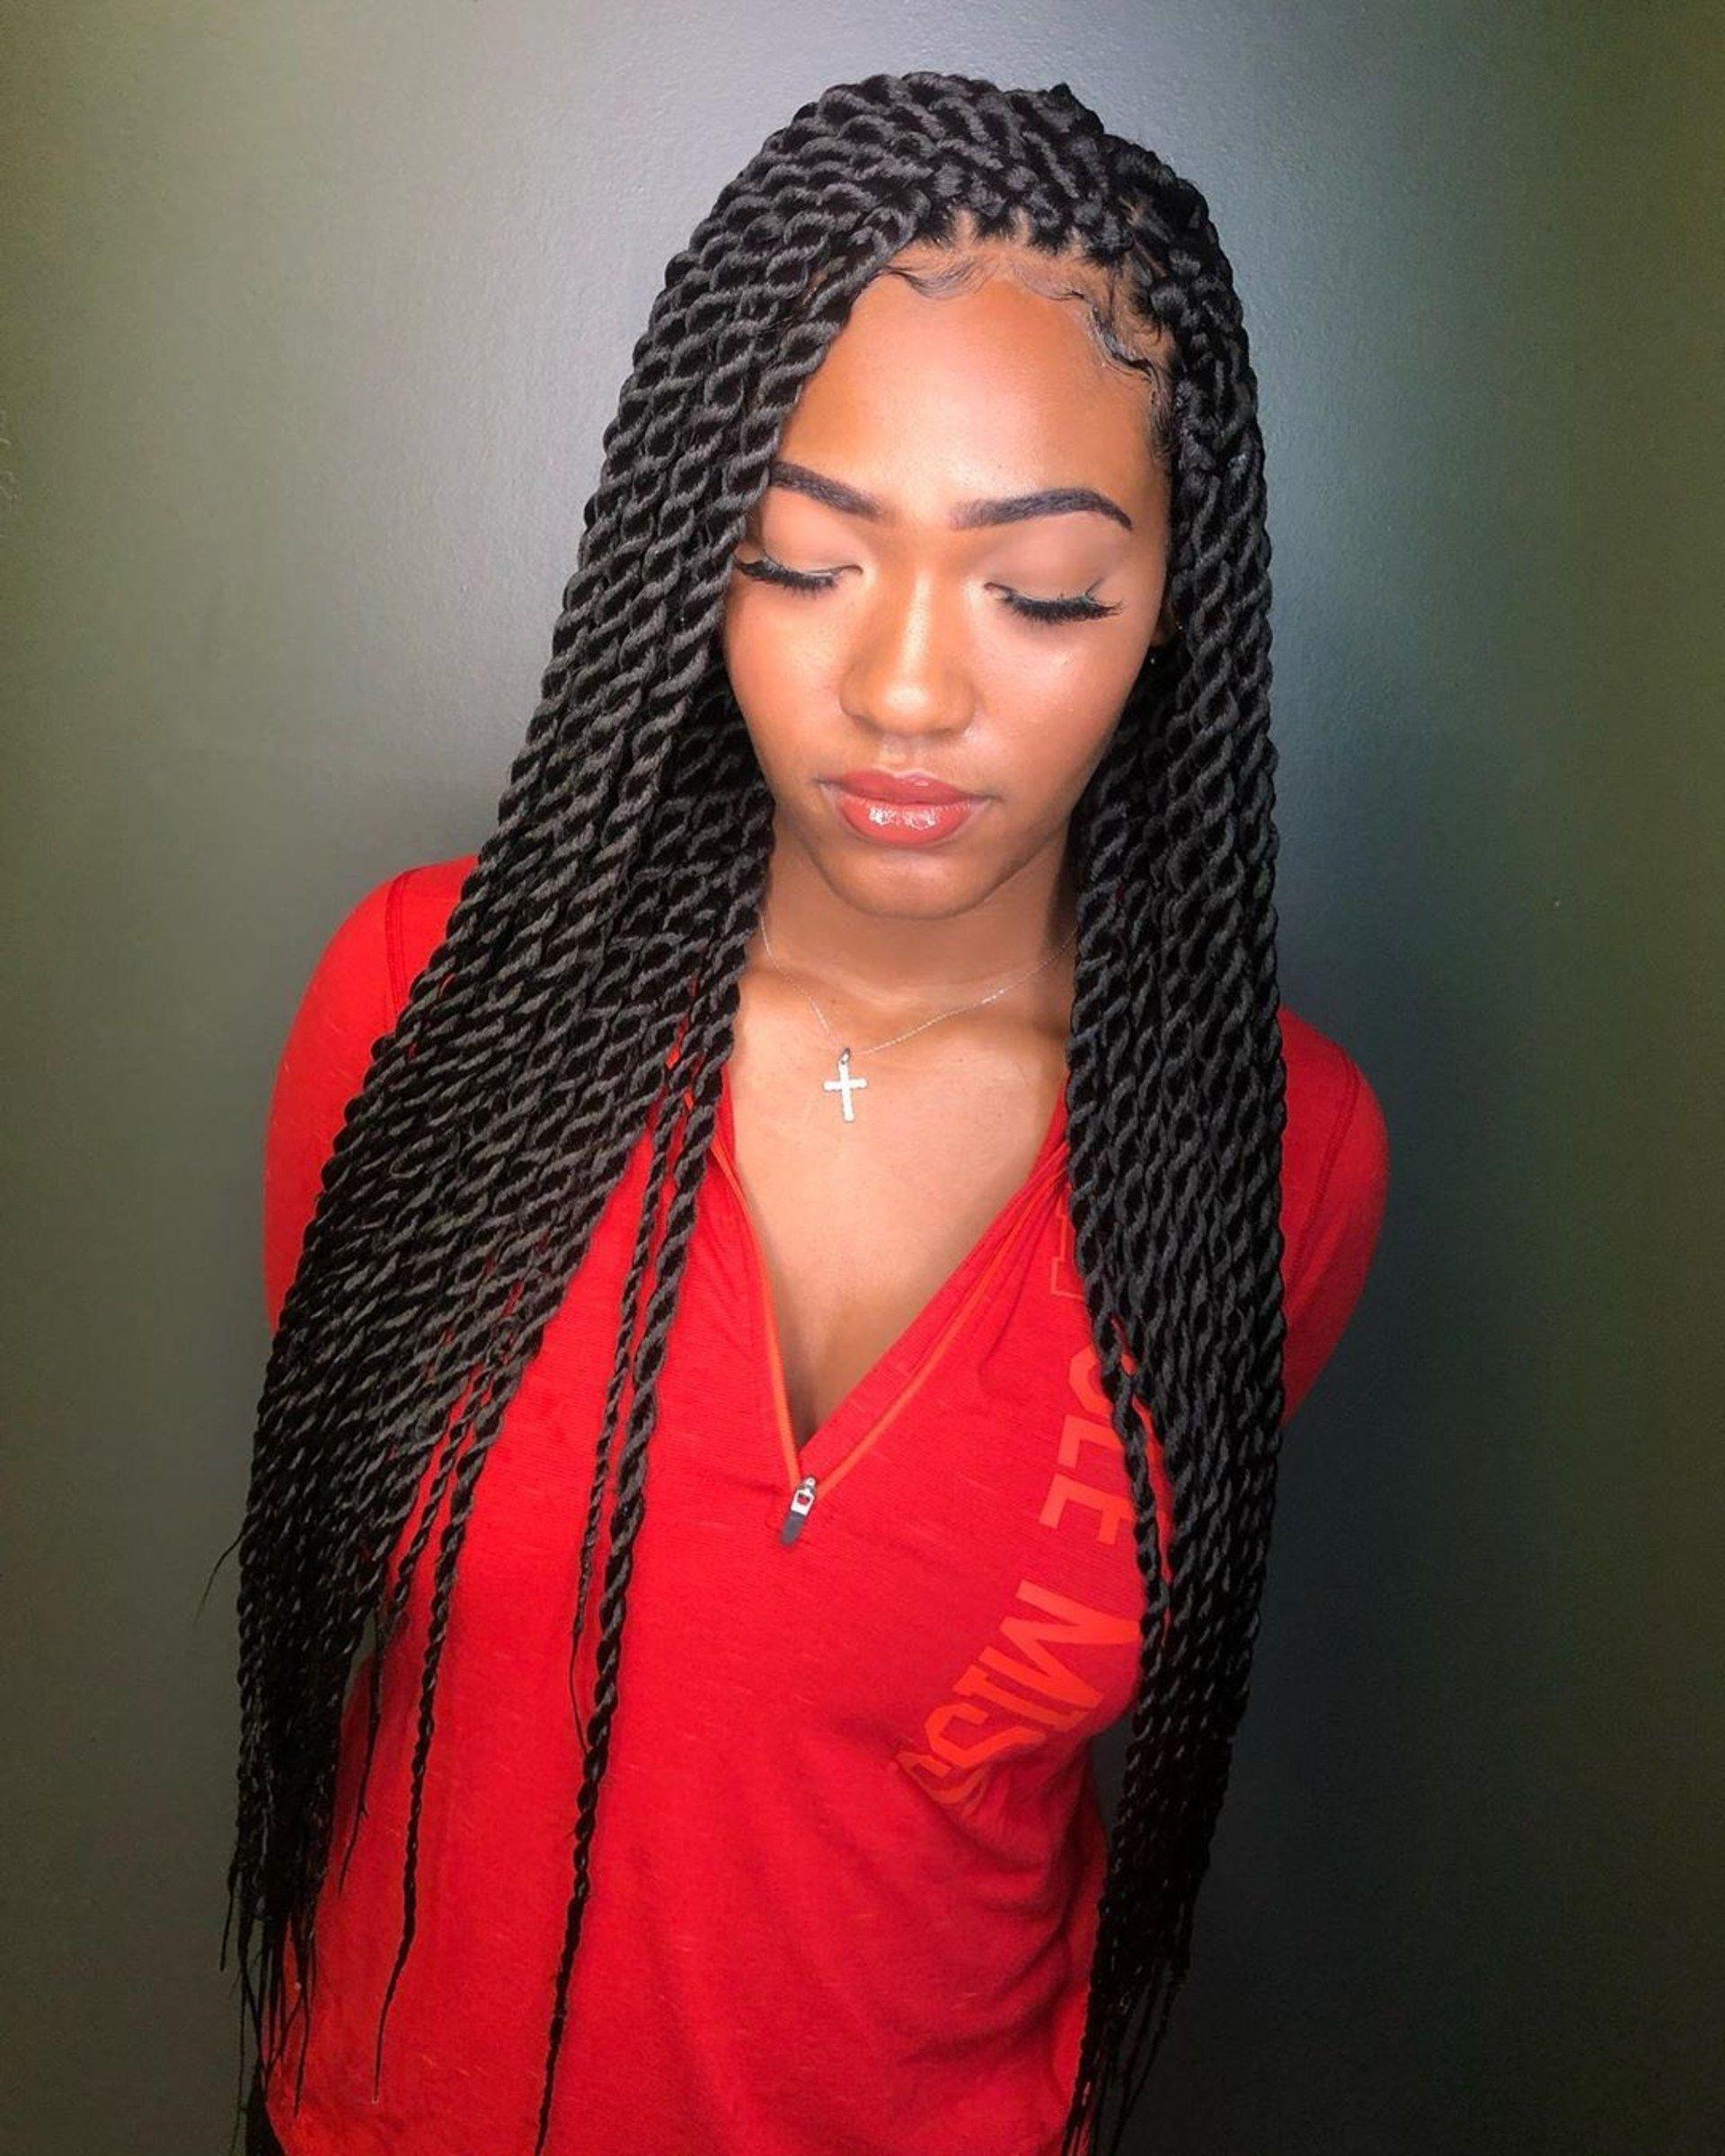 Braided Hairstyles For Black Womenn 2020 Braided Hairstyles Braids For Black Hair Braided Hairstyles For Black Women